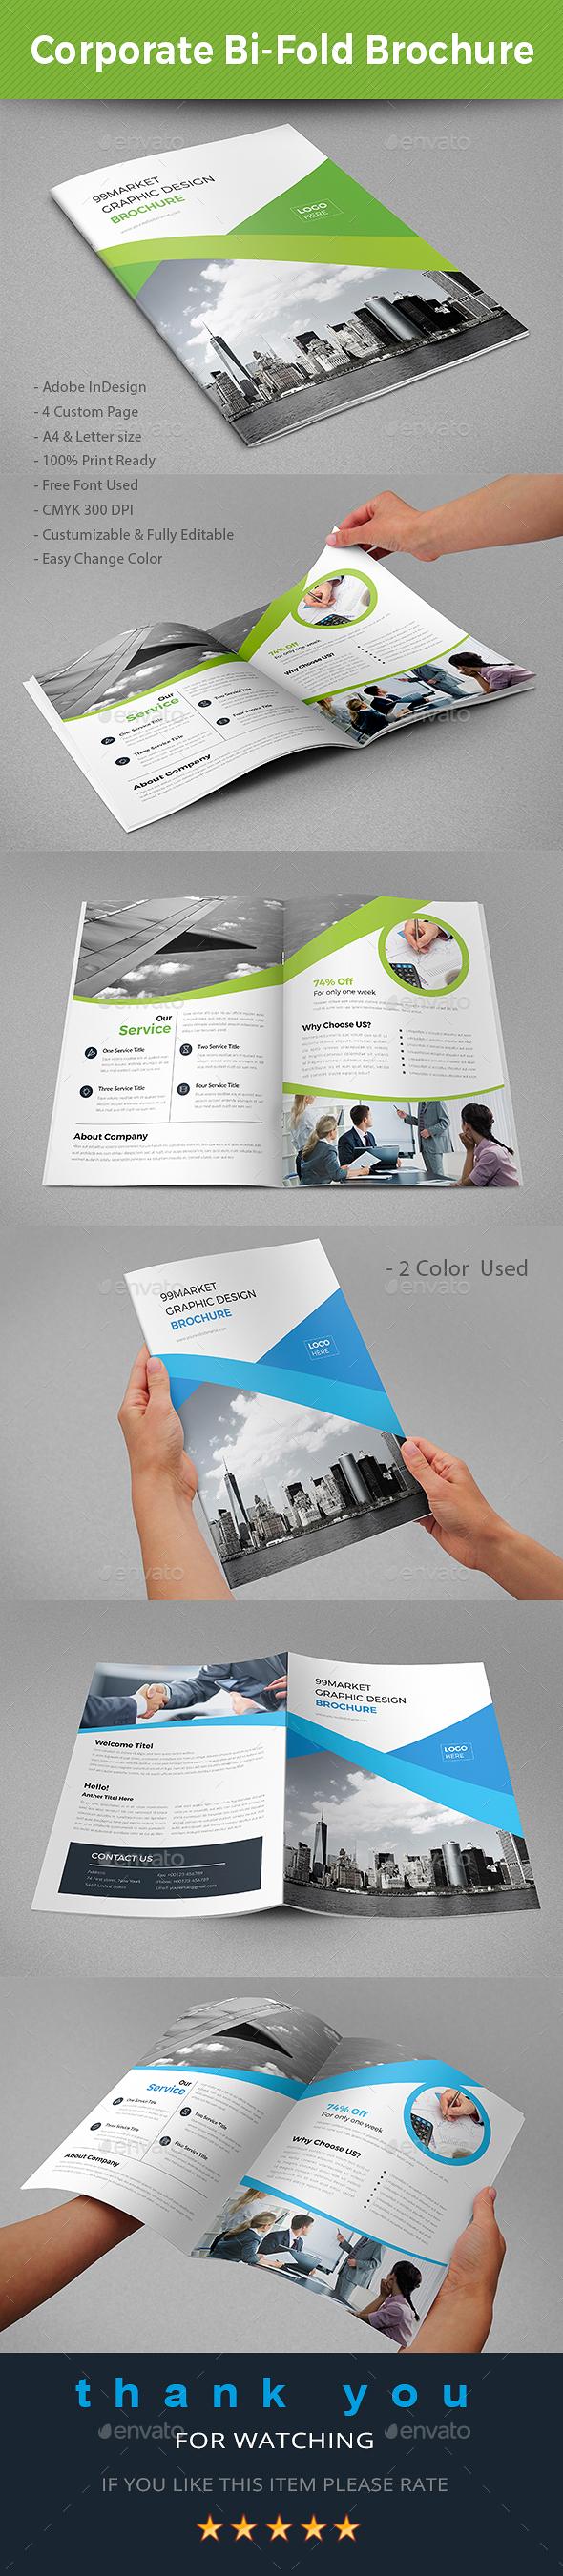 Corporate Bi-Fold Brochure - Brochures Print Templates